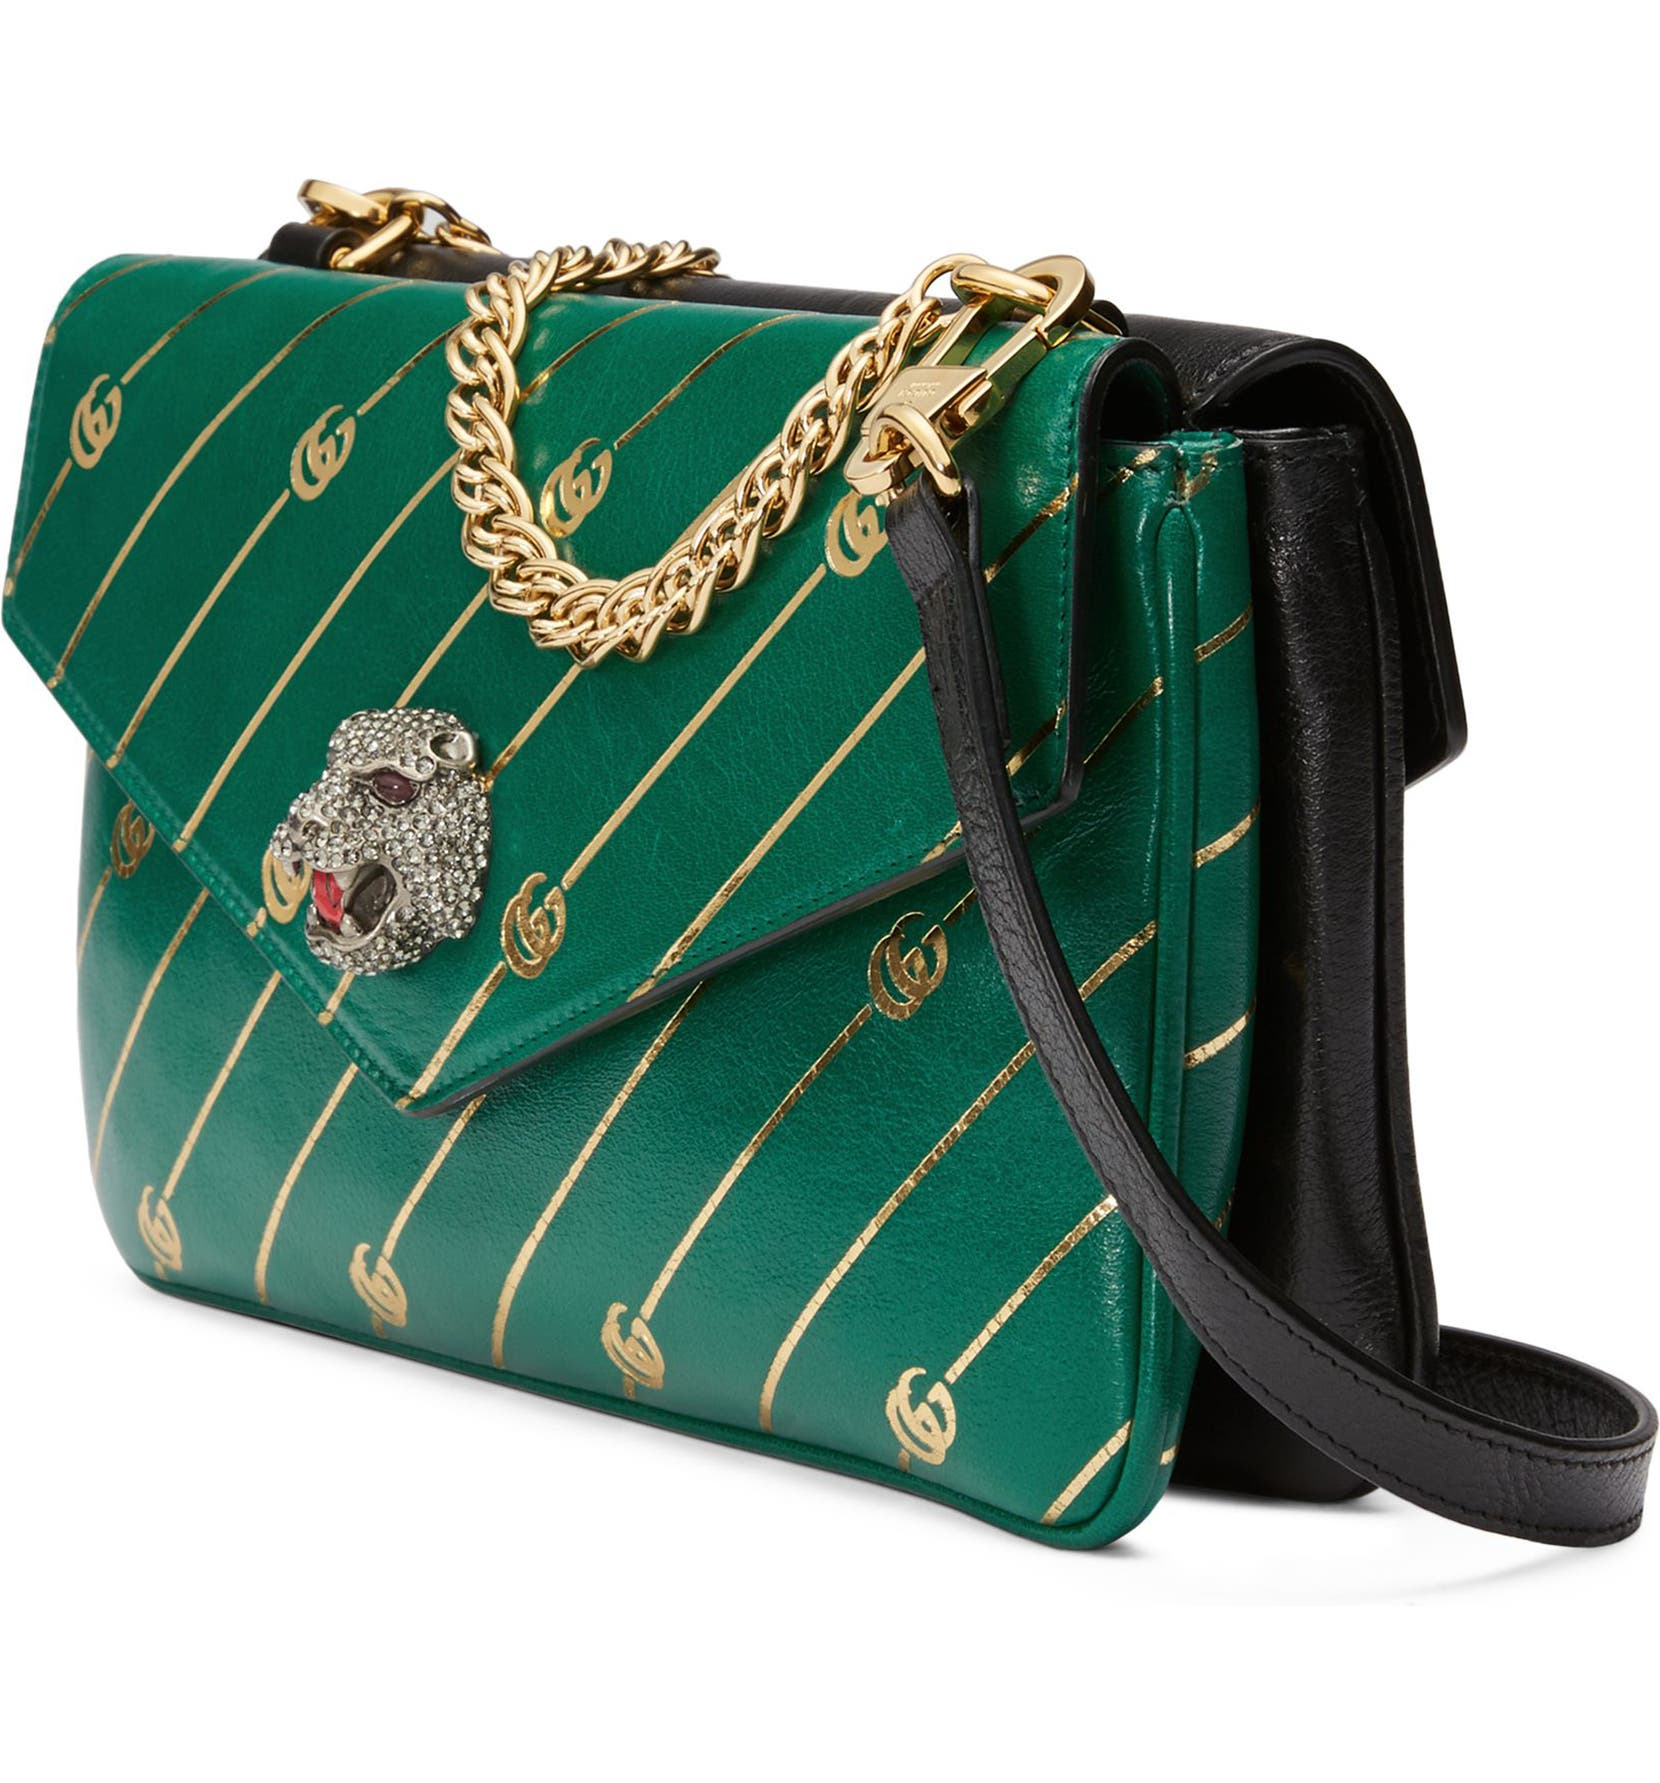 094a20dde510 Gucci Thiara Colorblock Leather Shoulder Bag   Nordstrom